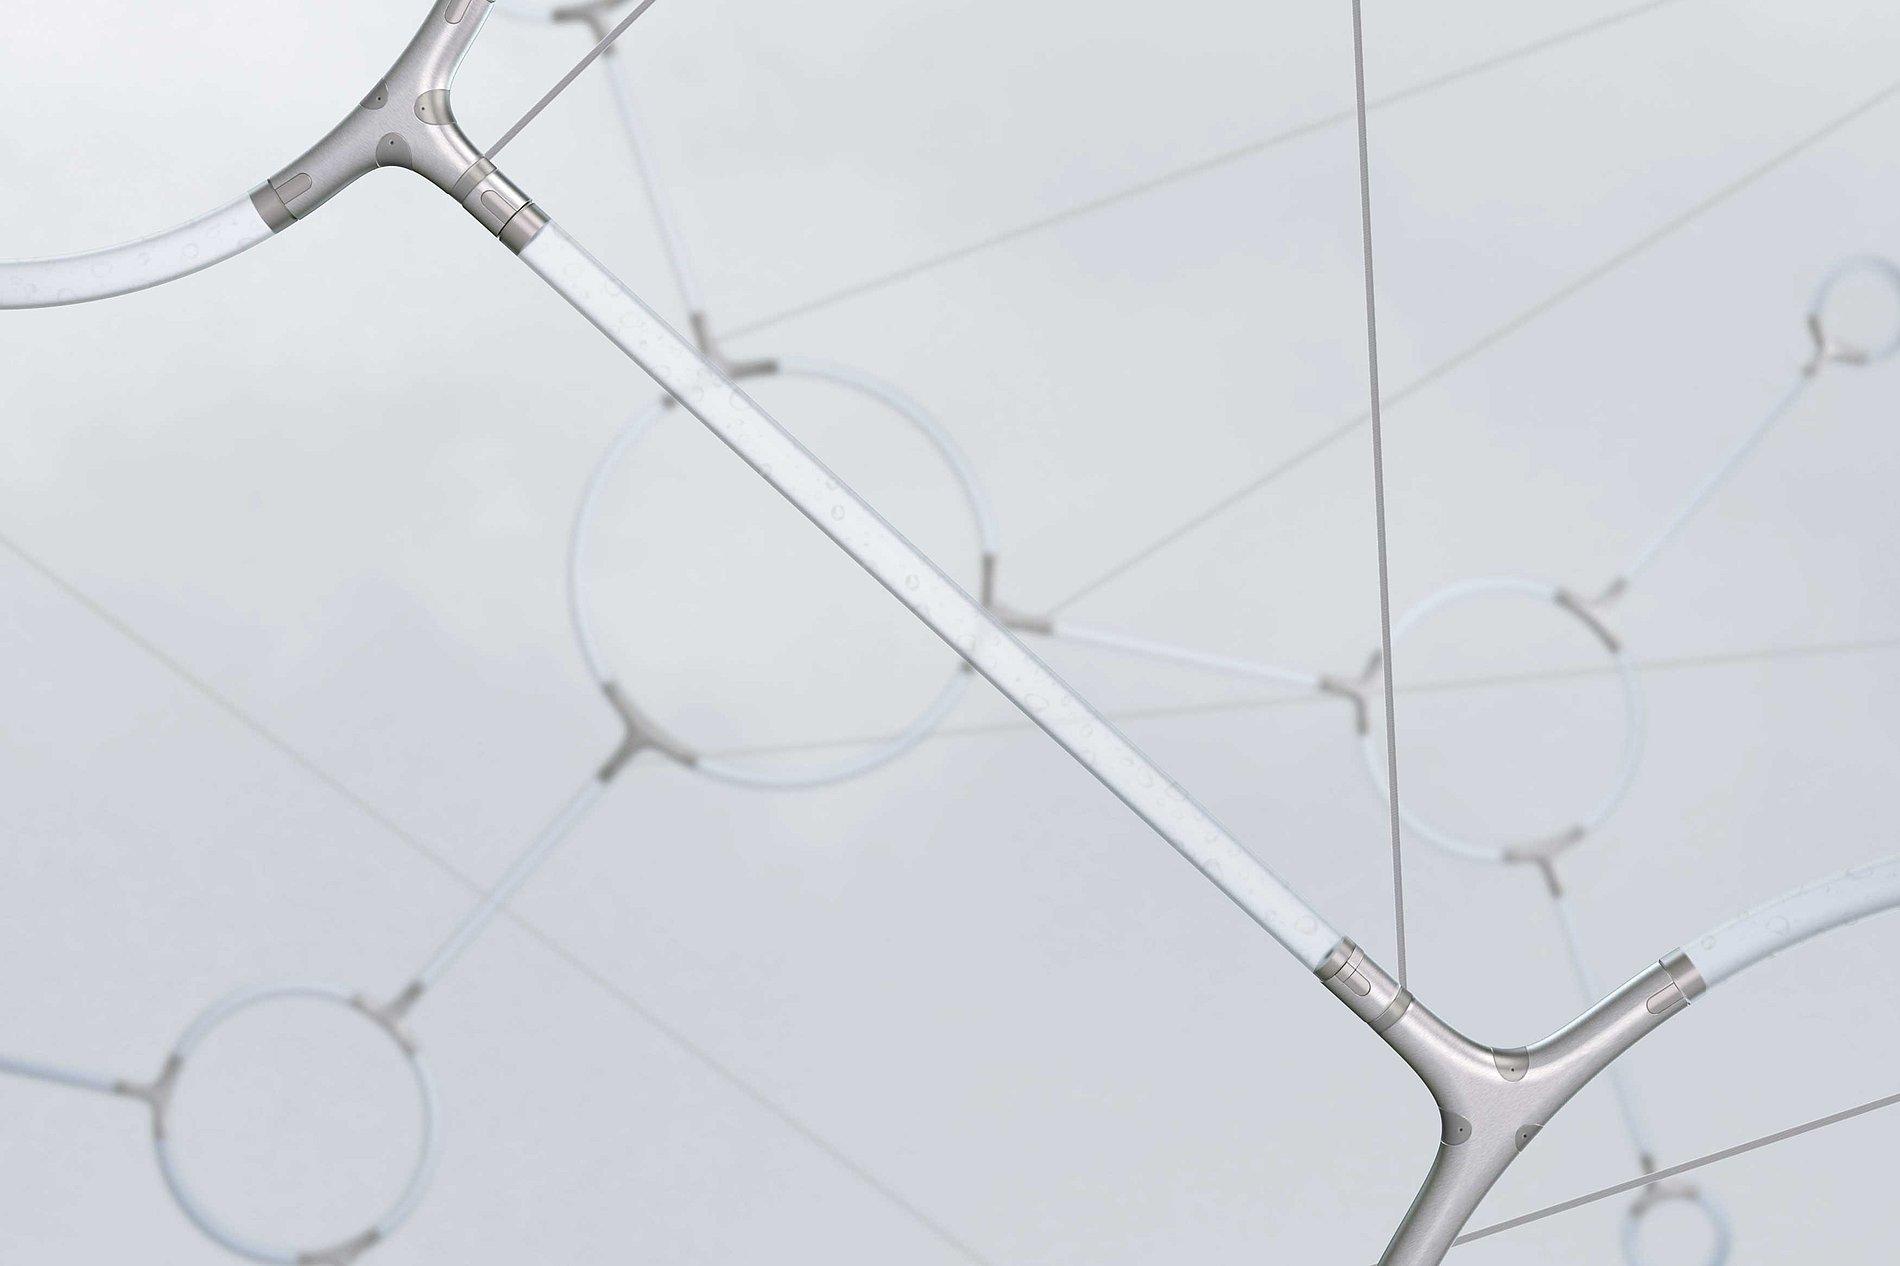 O - Mist / Light Diffusion System | Red Dot Design Award